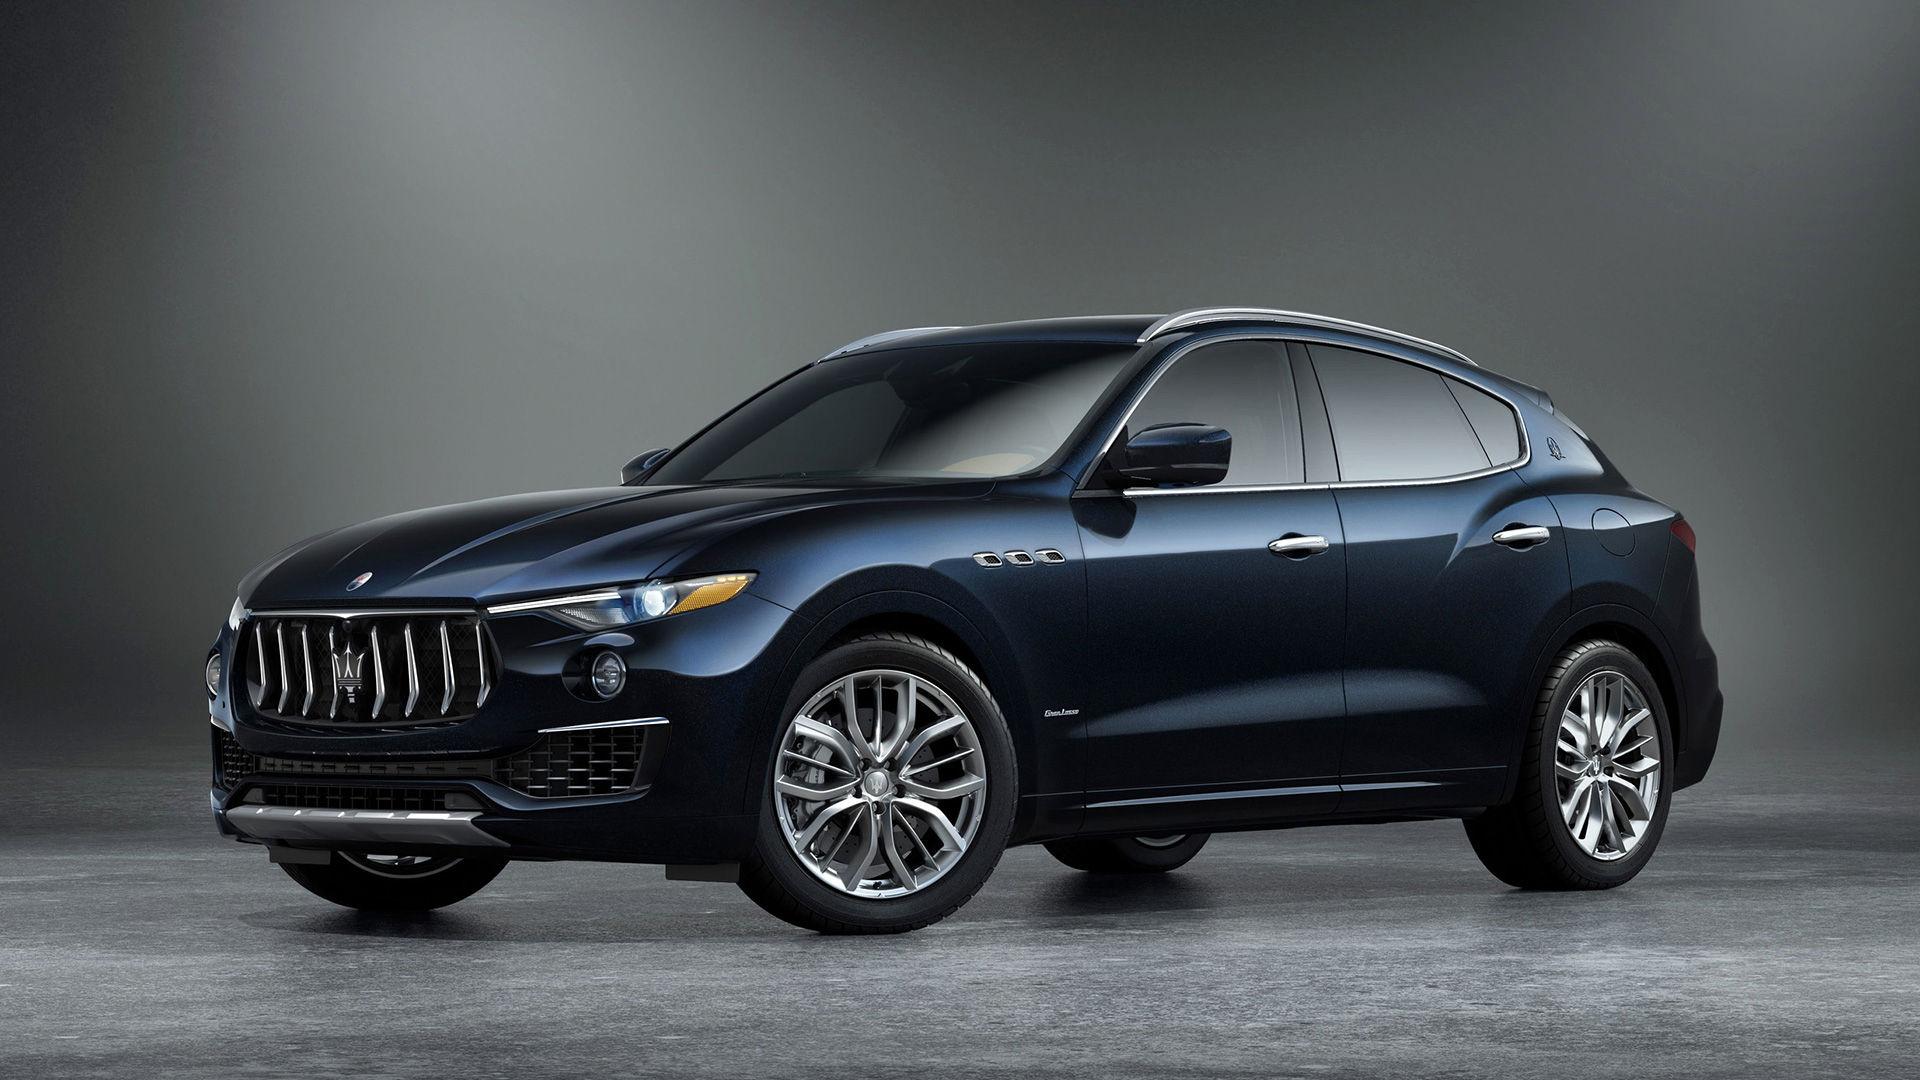 Maserati Levante Edizione Nobile - vue latérale - couleur Bleu Nobile (bleu roi)